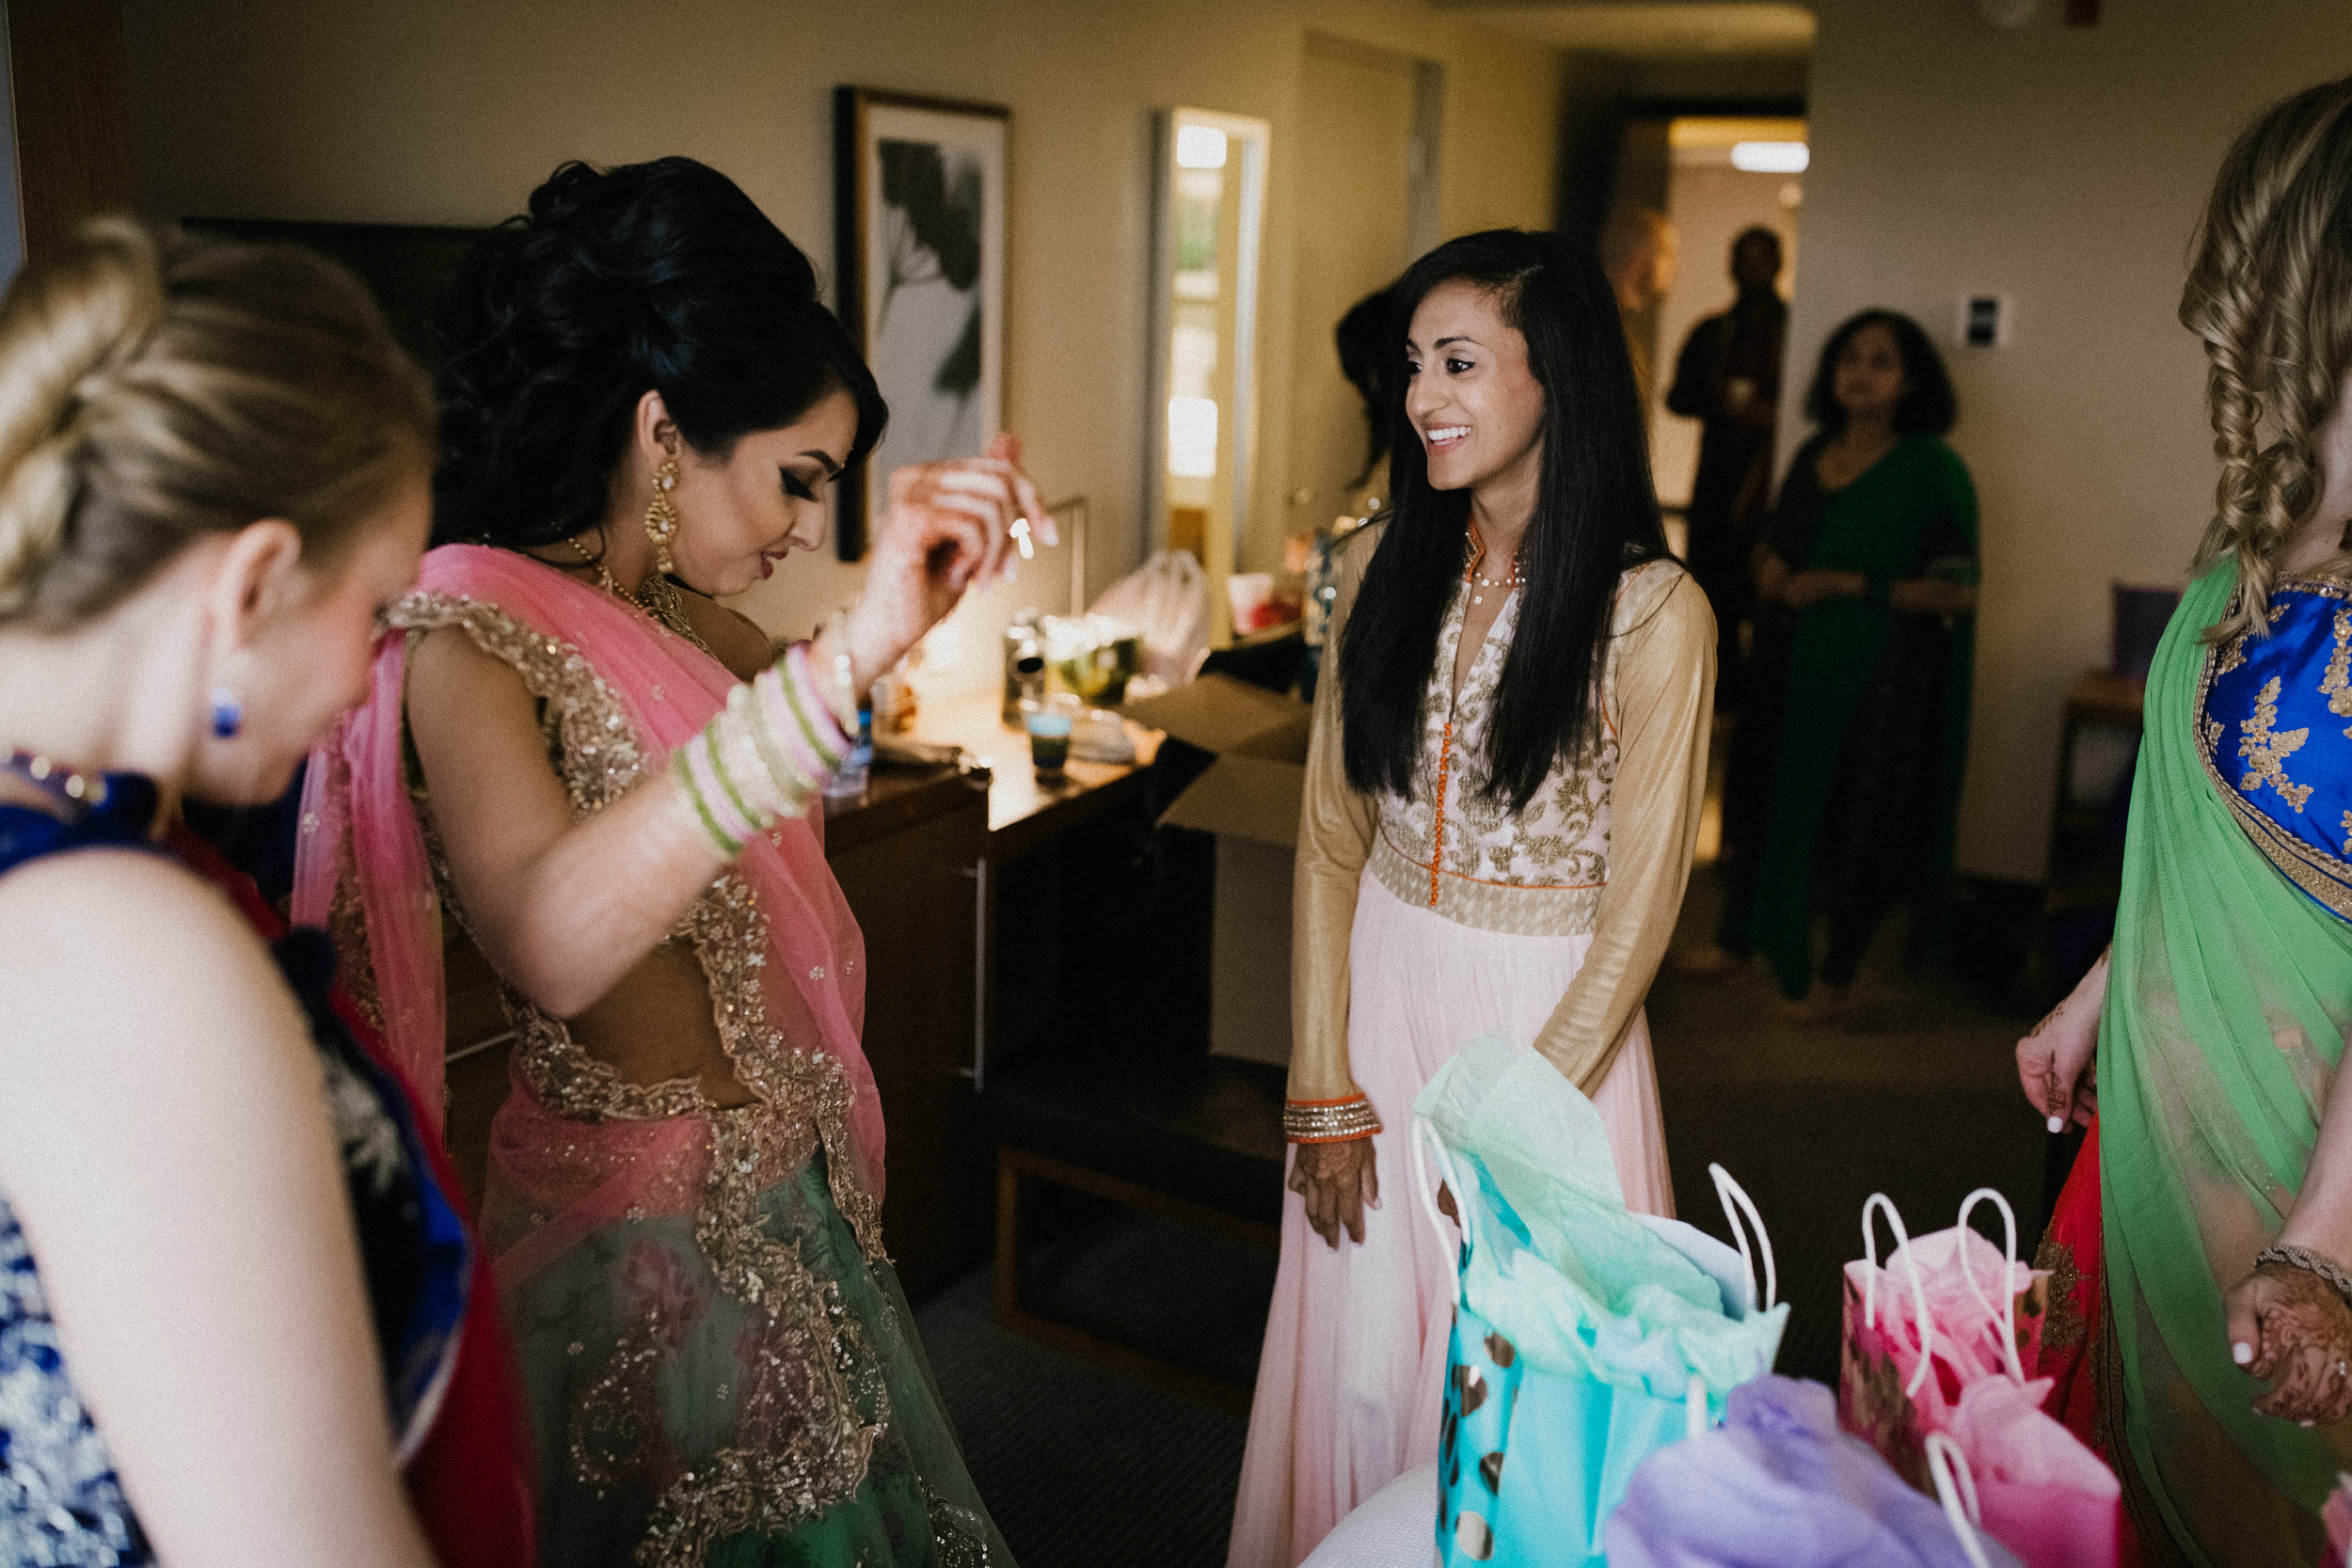 Aparna-Ankit-Patel-Shah-Mid-West-Michigan-Shadow-Shine-Pictures-Videographers-Indian-Wedding